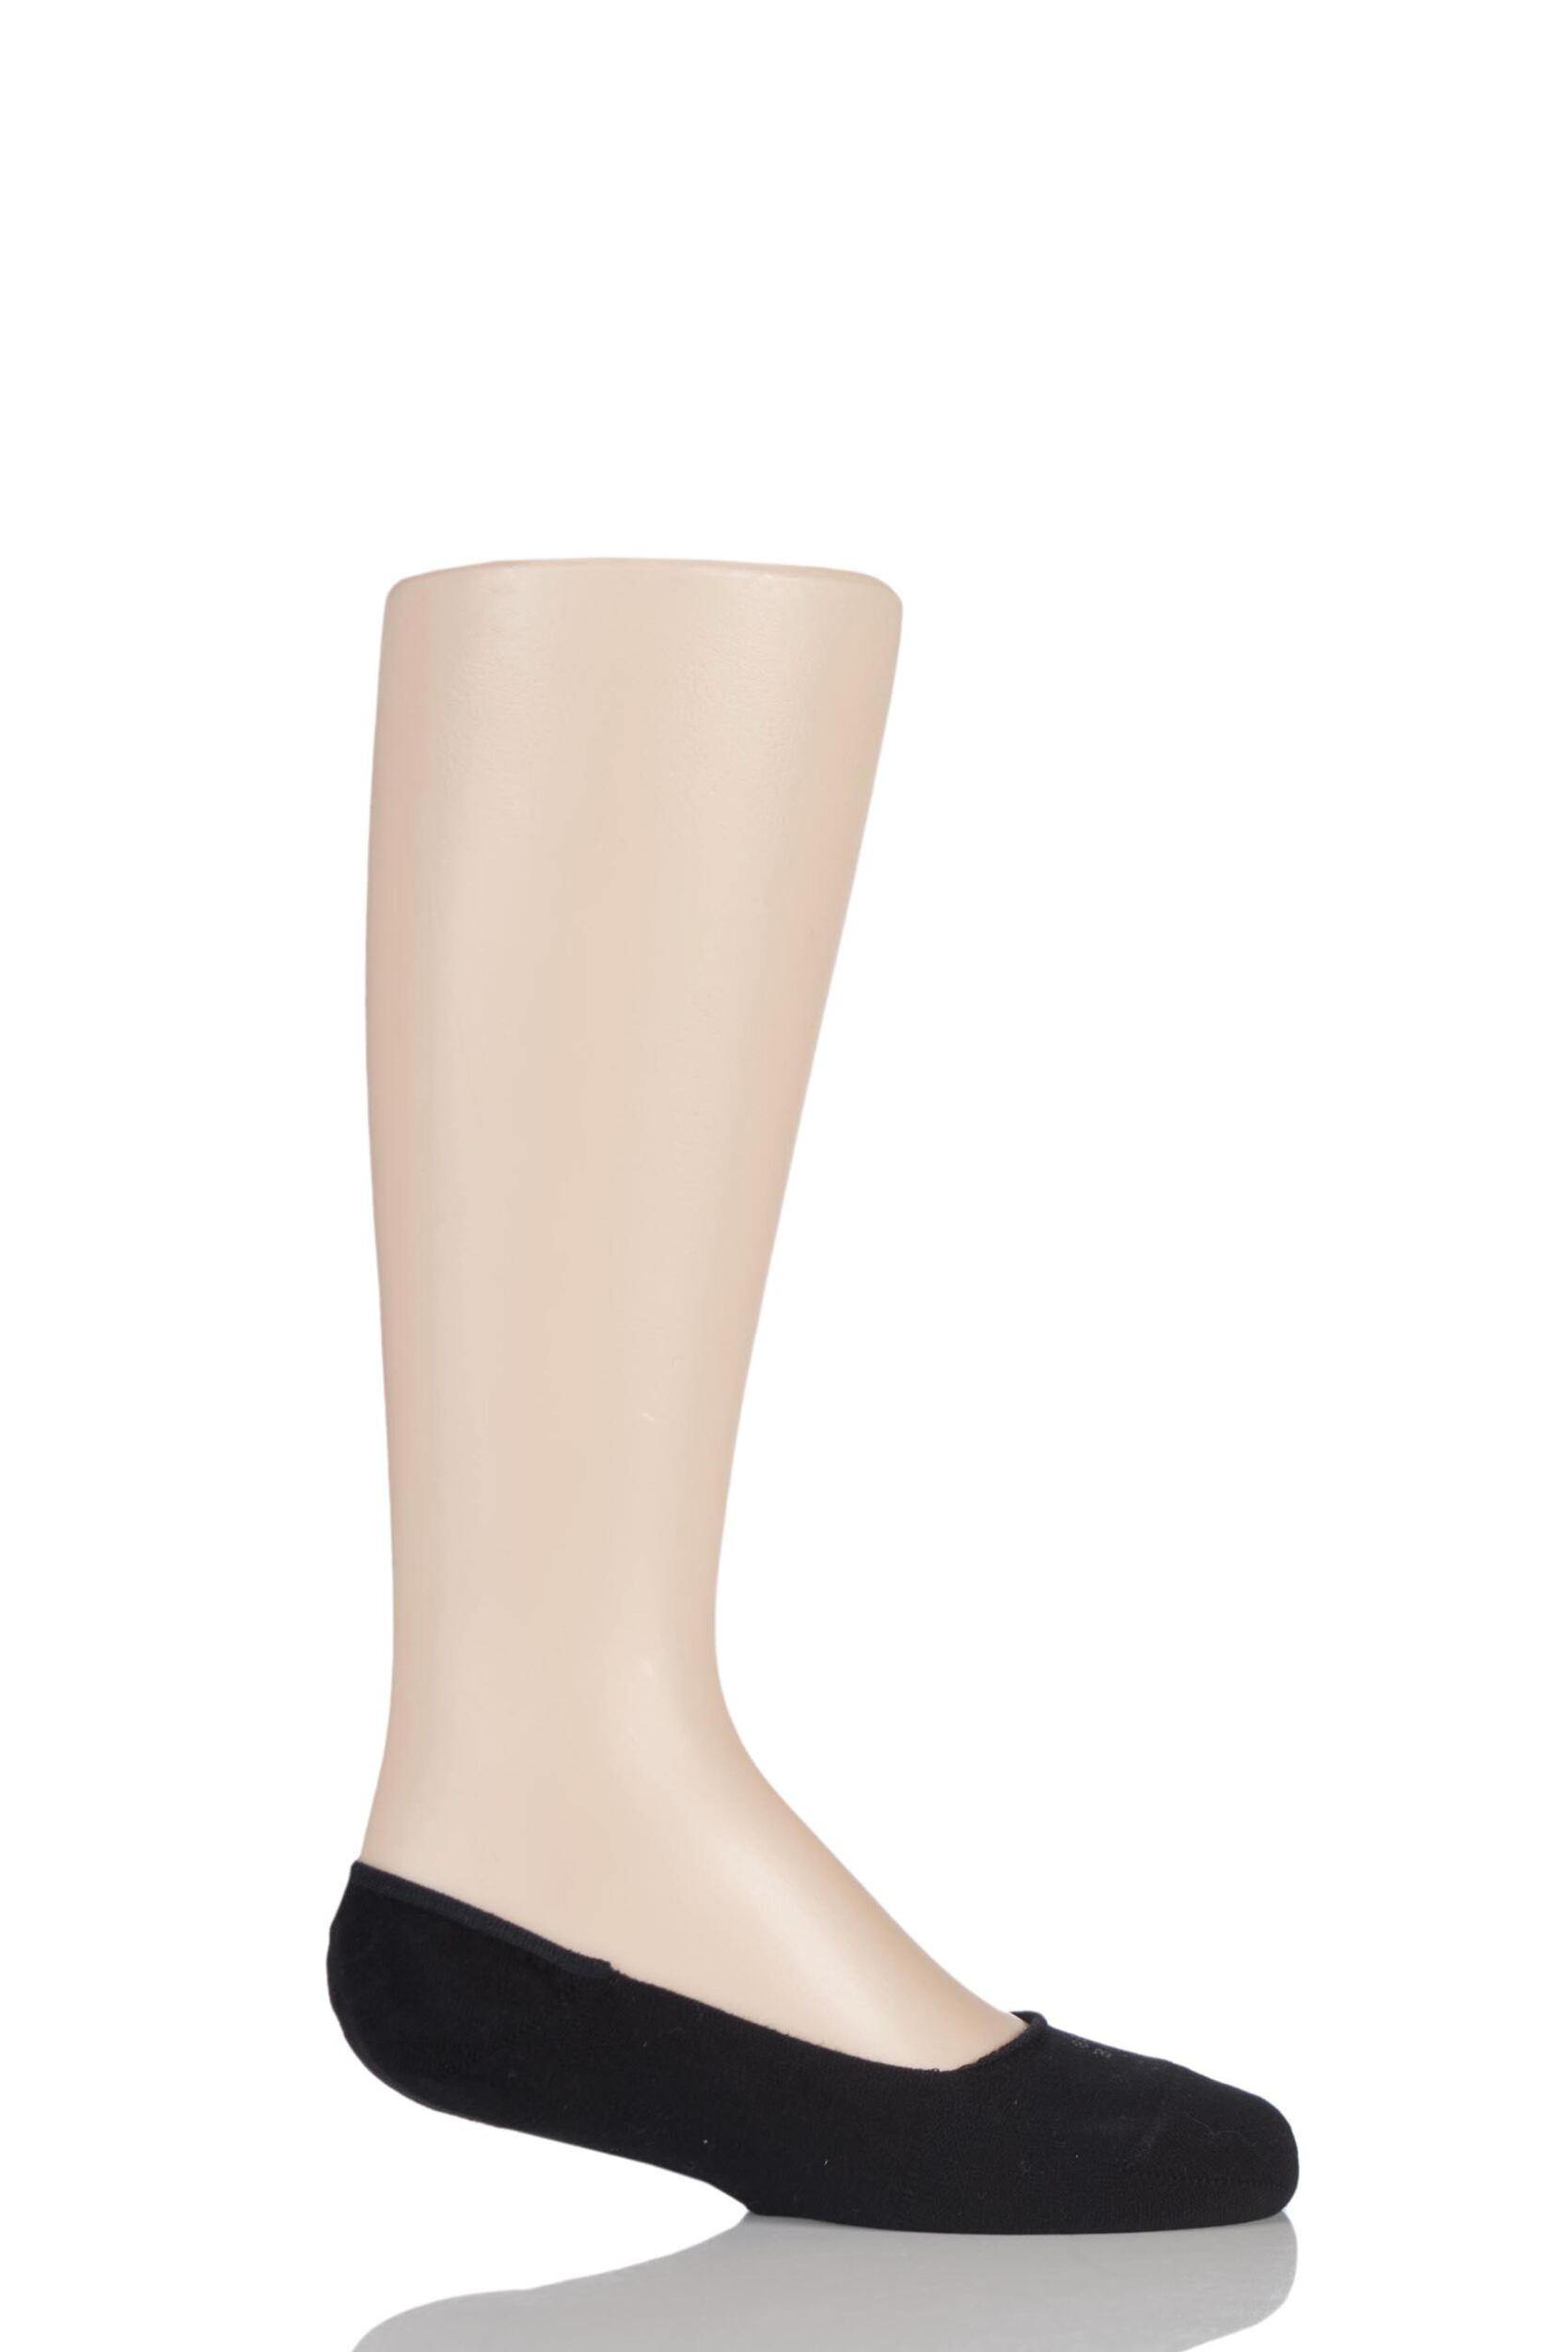 1 Pair Black Invisible Step Shoe Liners Kids Unisex 12-2.5 Kids (7-11 Years) - Falke